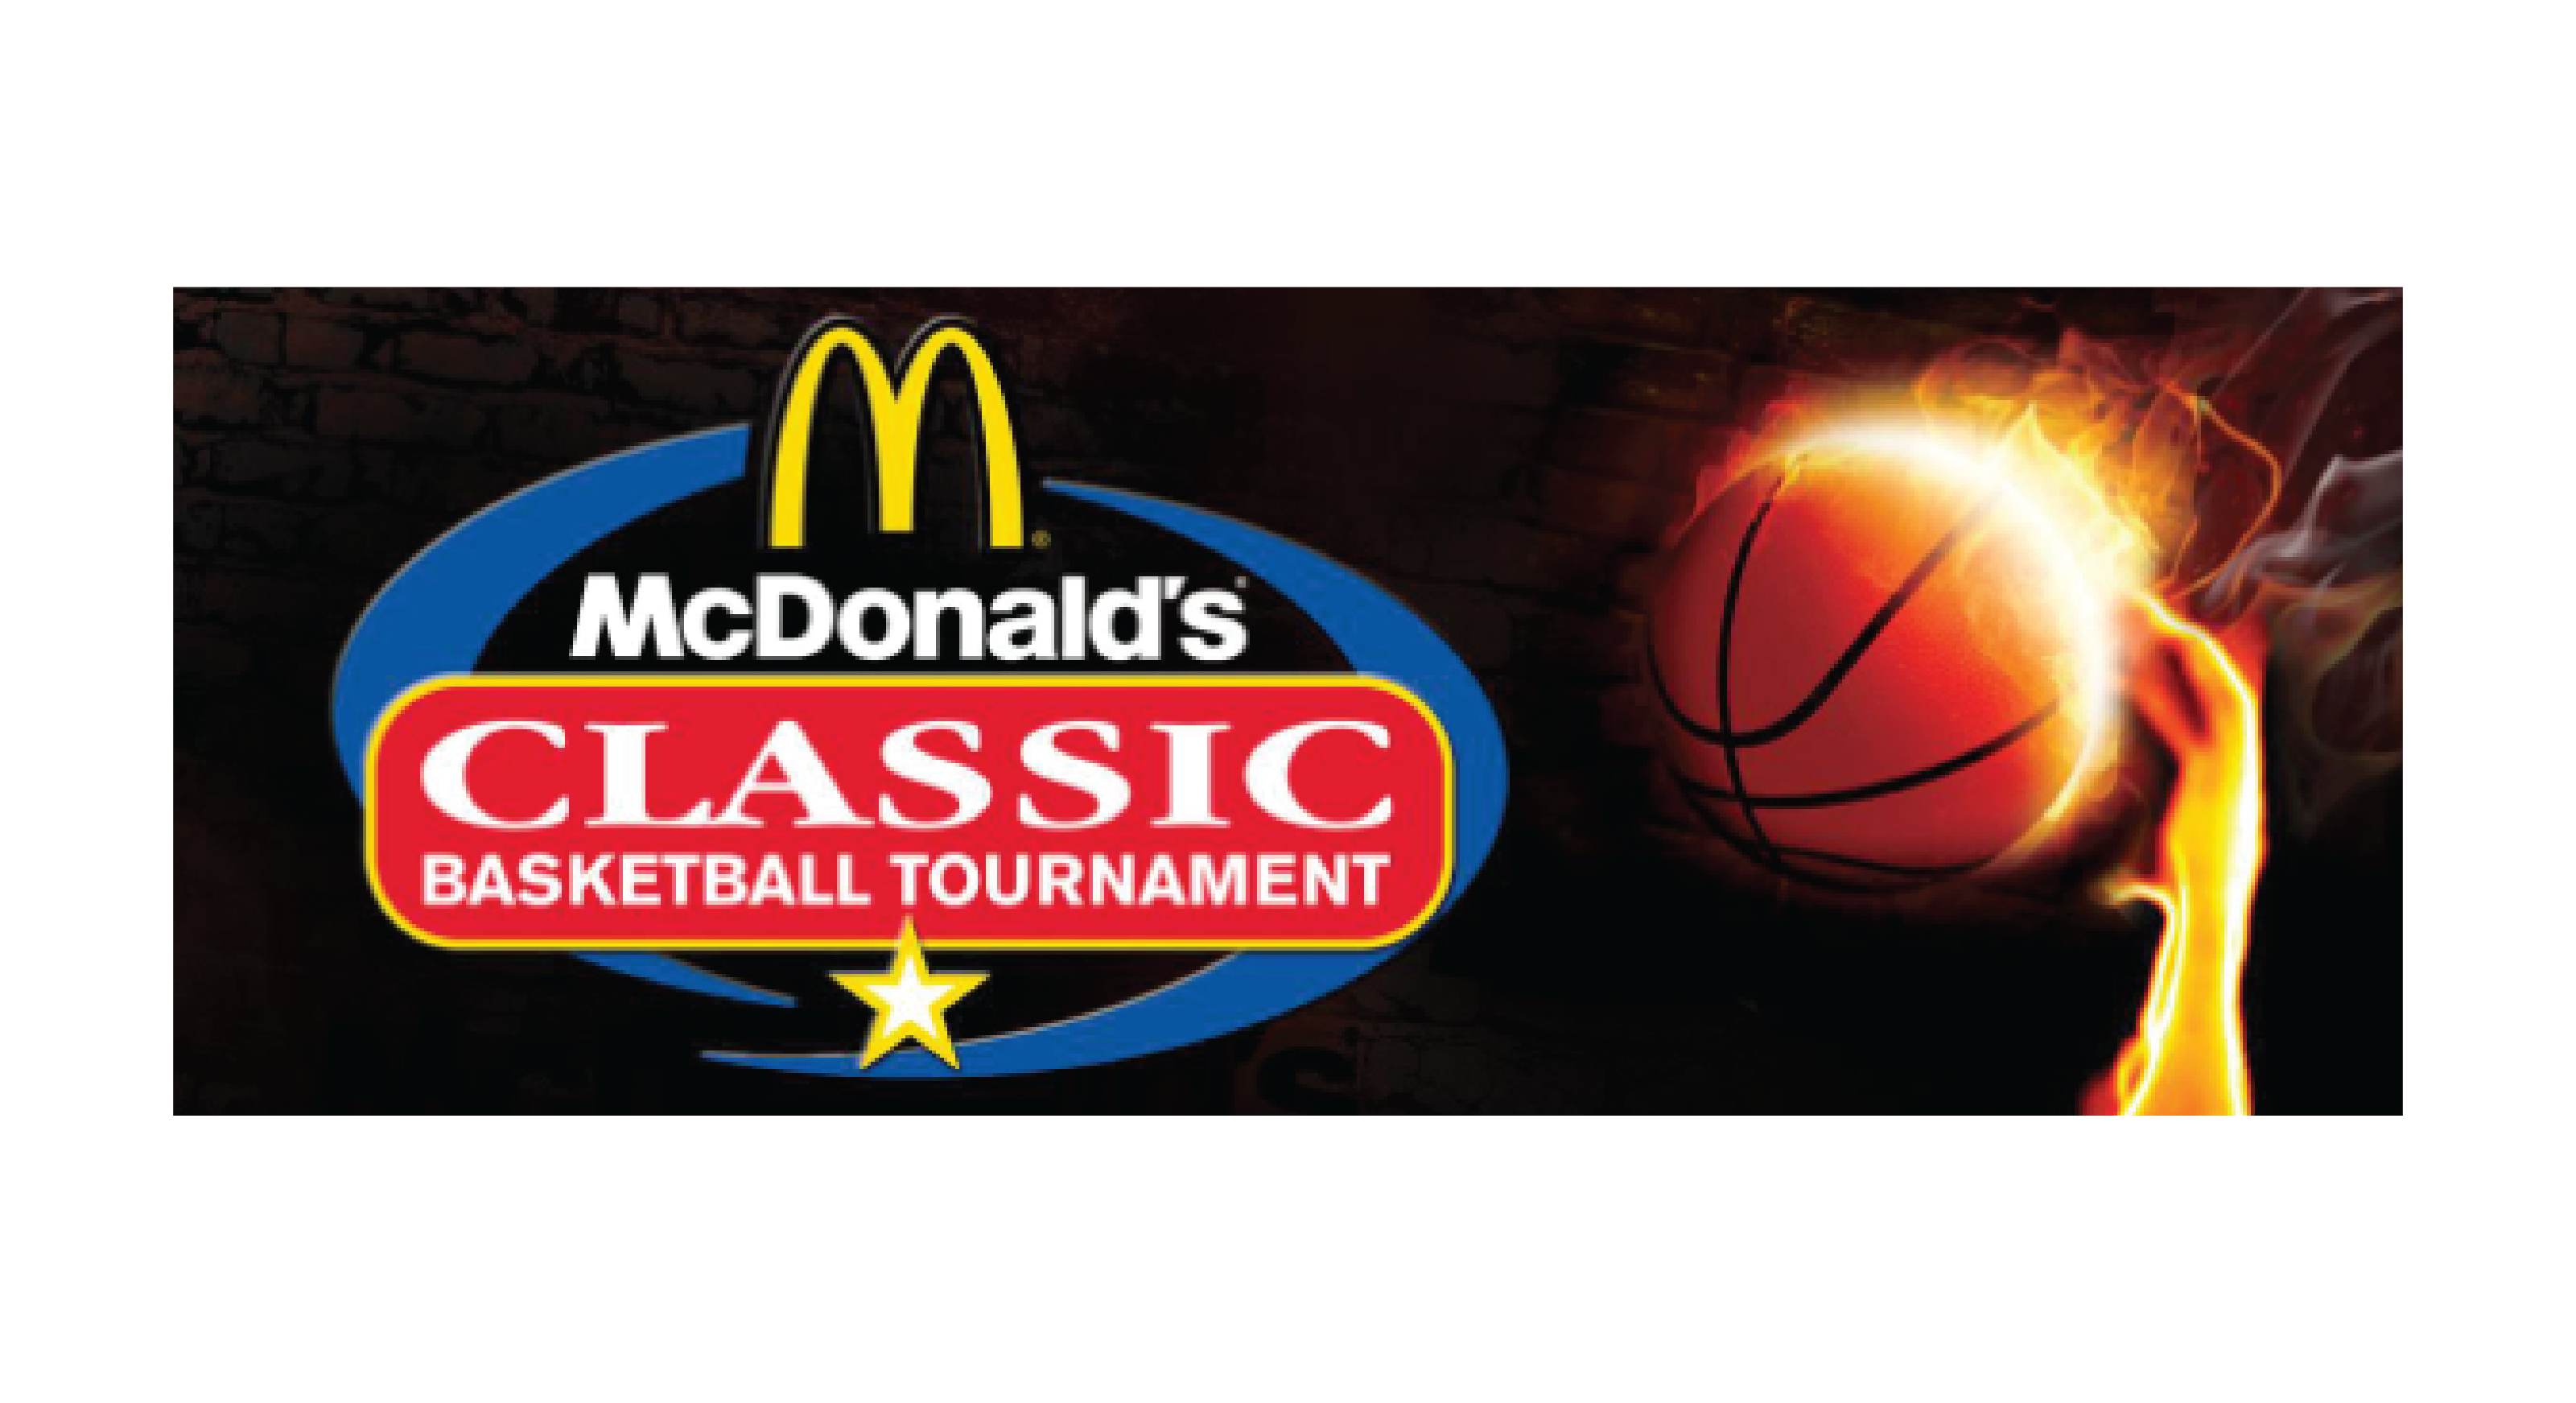 McDonald's Classic Basketball